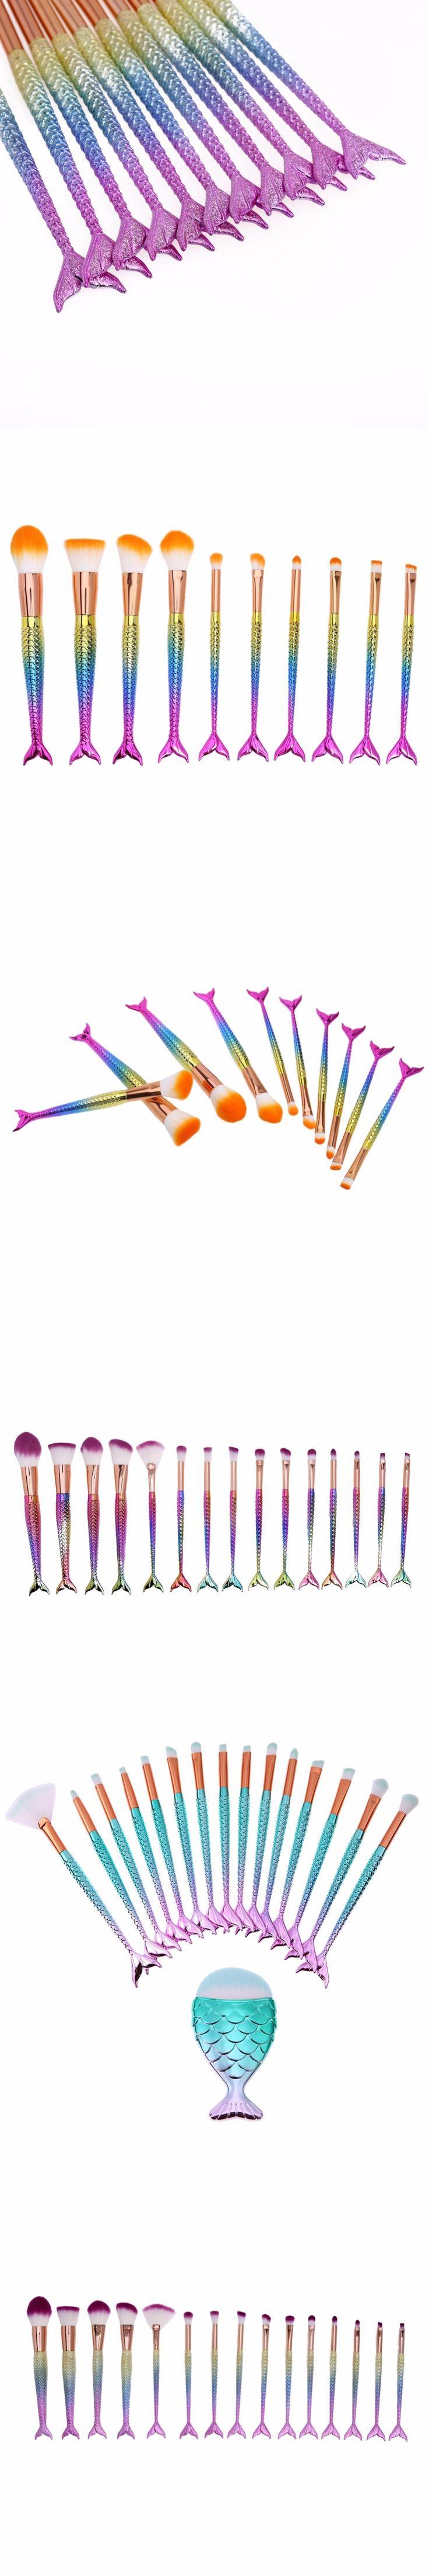 1/4/5/10/15PCS Makeup Brushes Colorful Mermaid Brush Set Foundation Blending Blush Powder Eyeshadow Lip Brush Make up Brushes